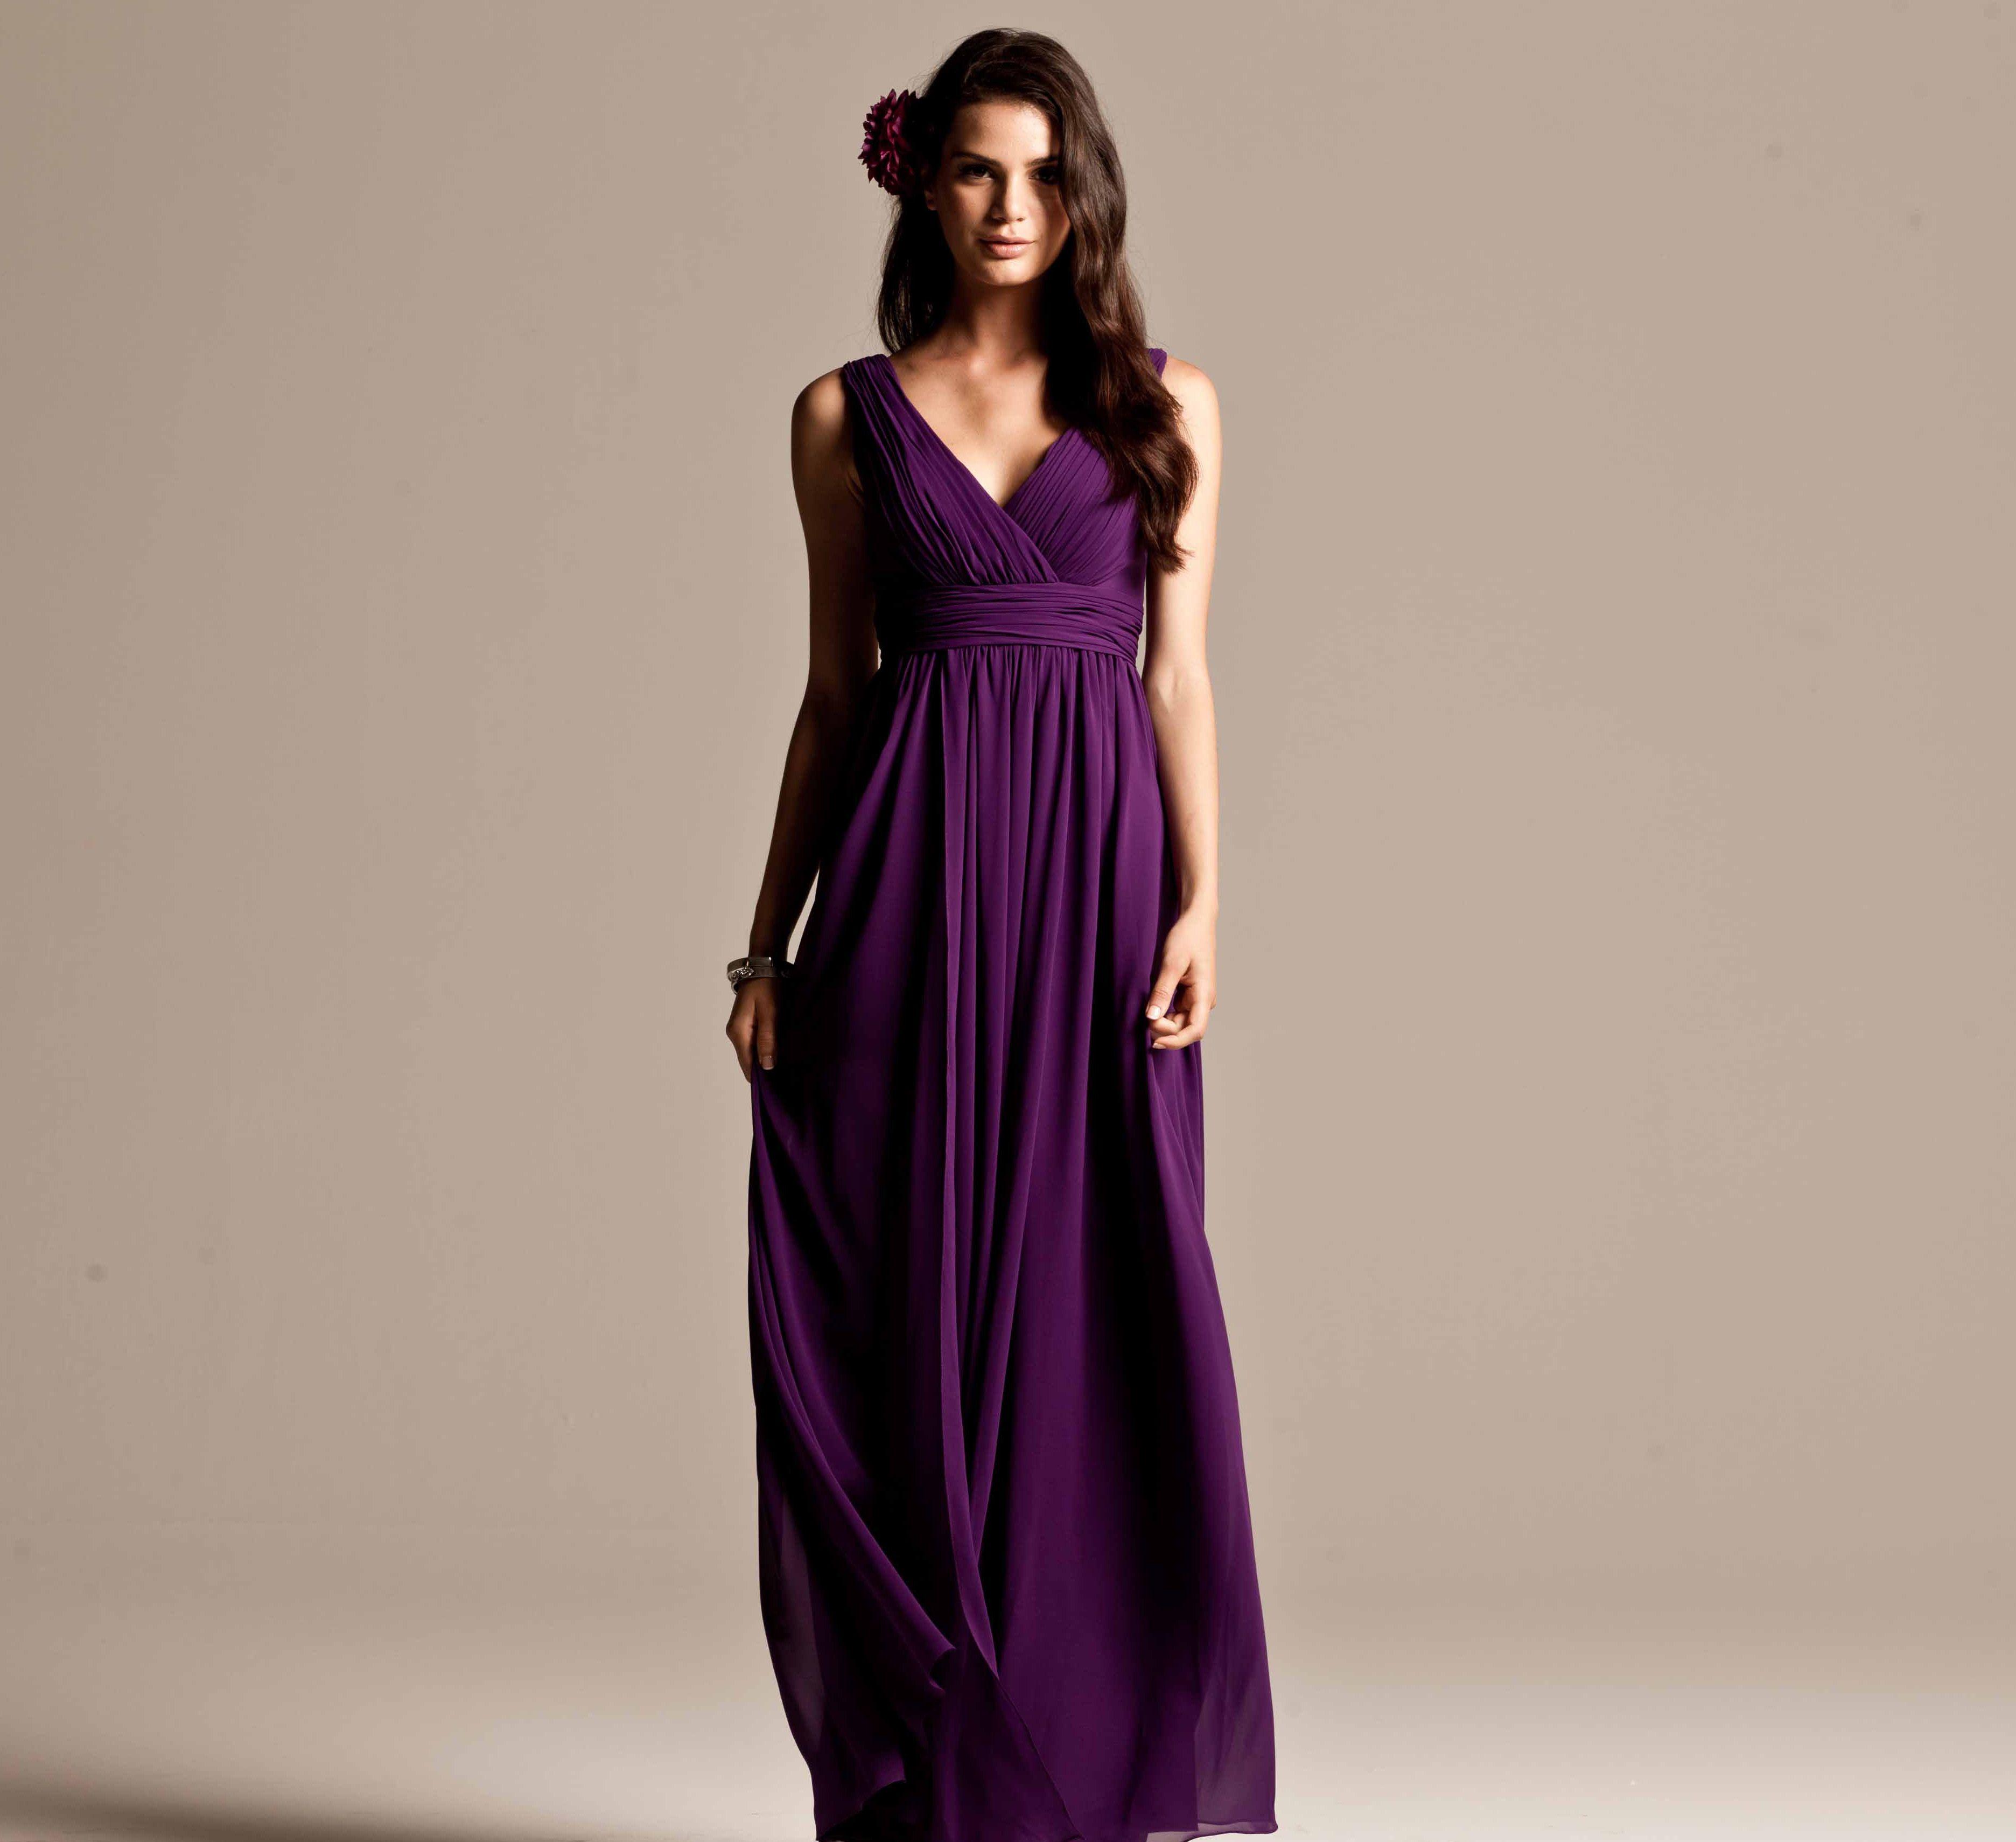 997a93e7a9317 Zara purple #bridesmaid #dresses Natasha Millani 2013  http://www.natashamillani